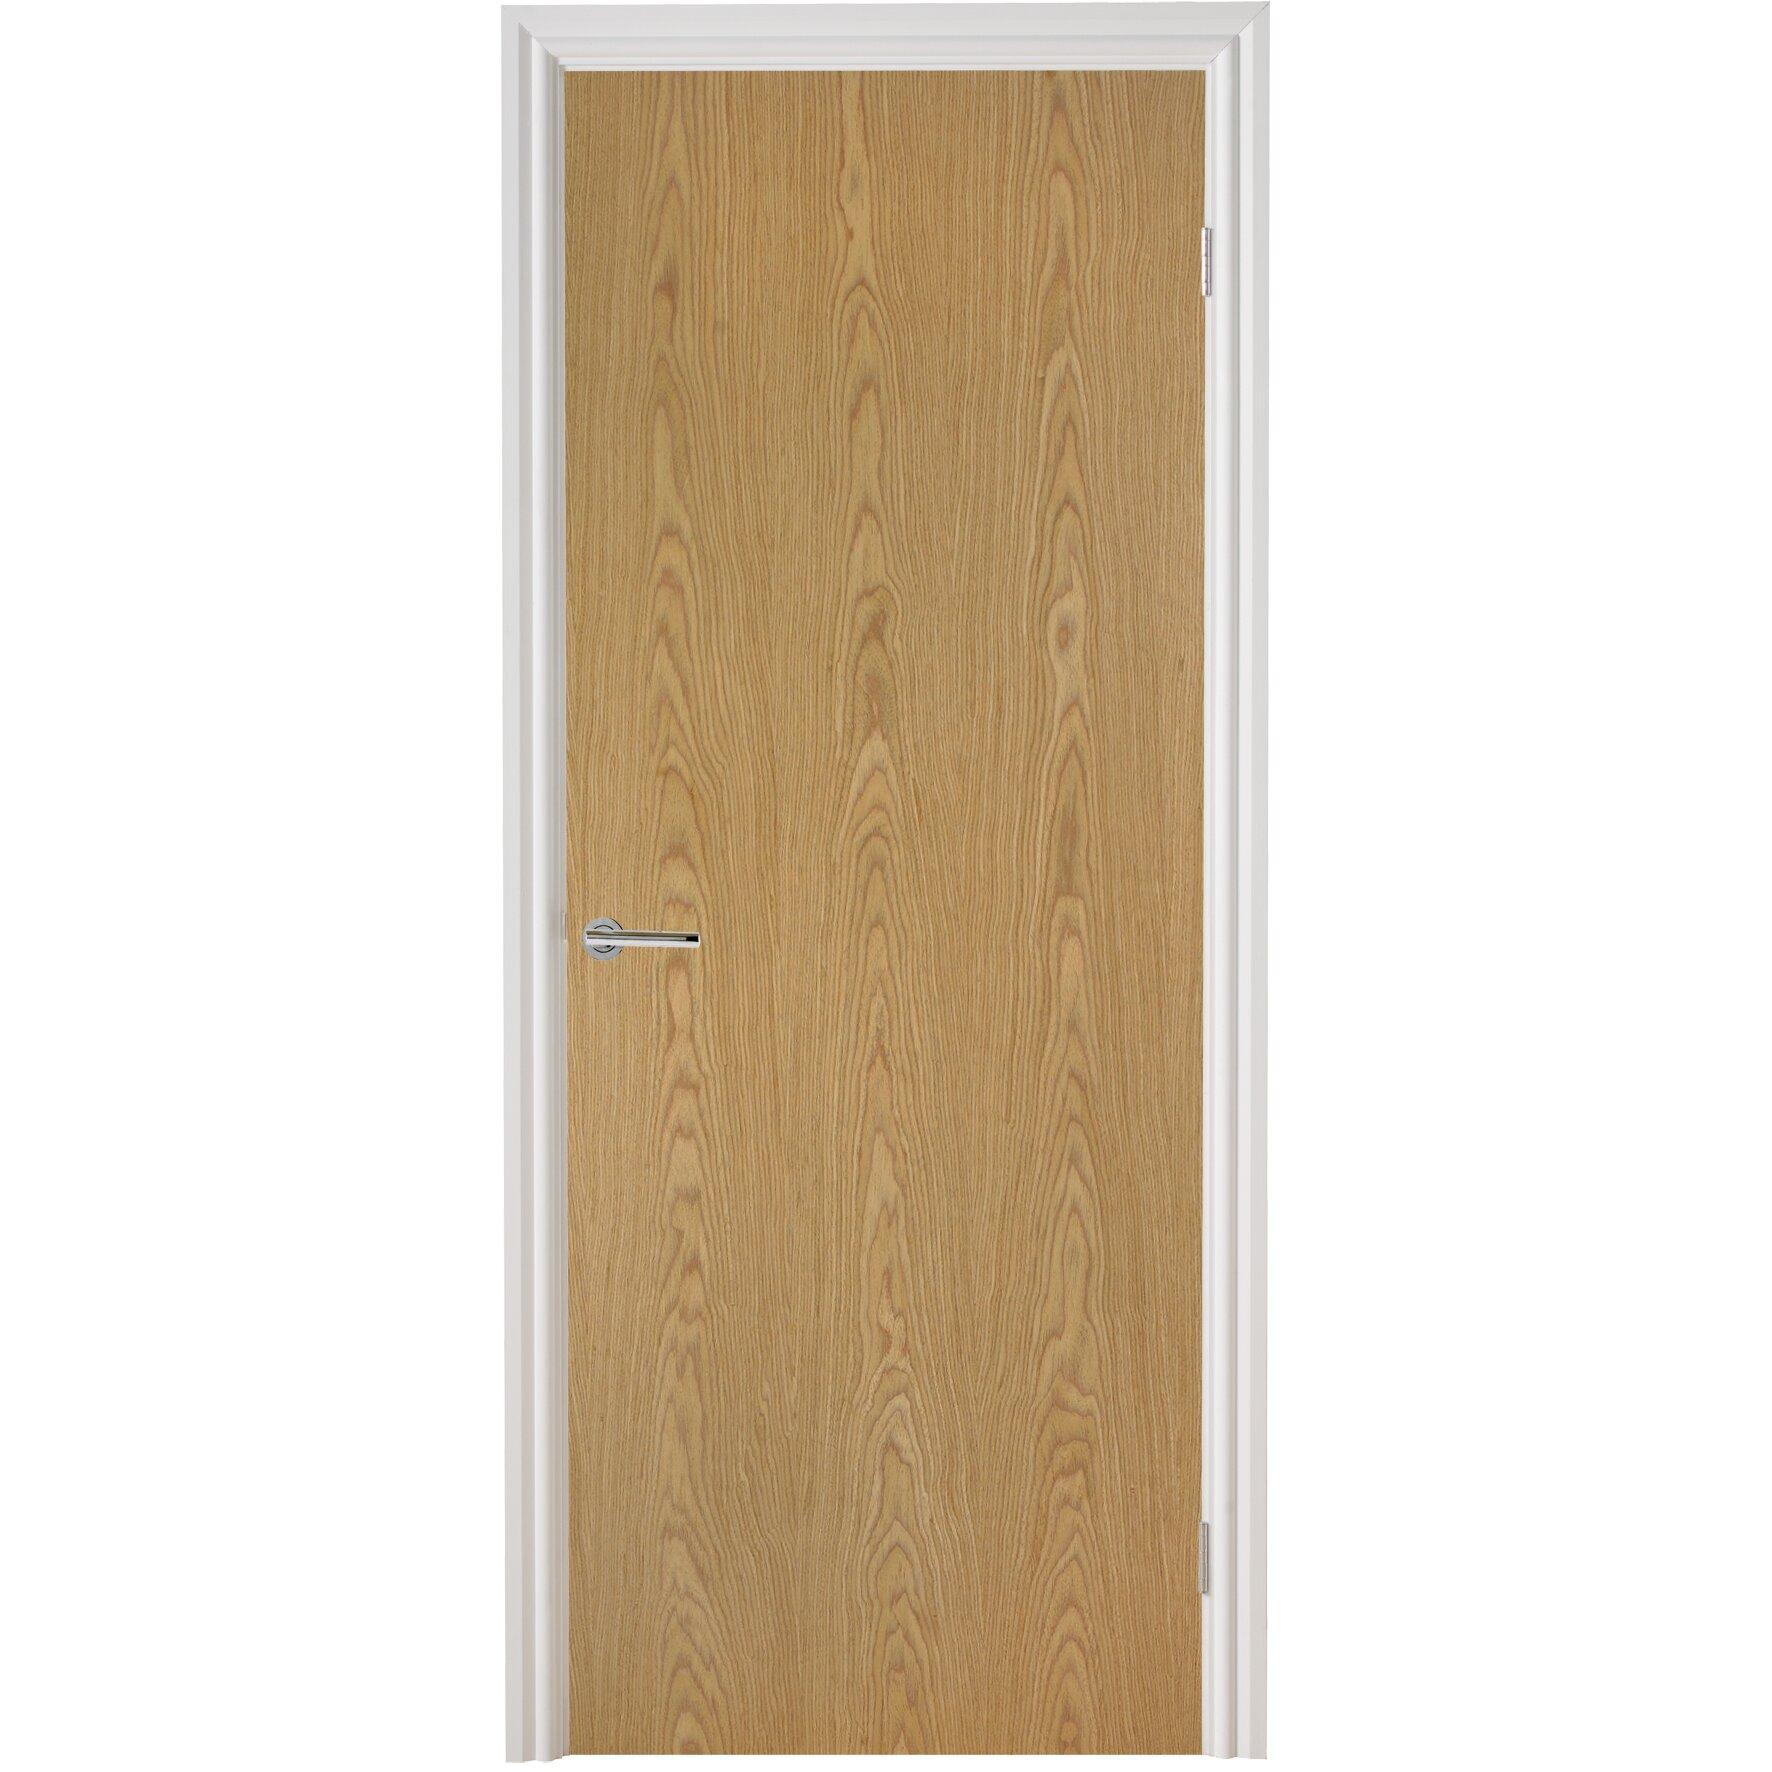 premdor wood veneer oak fire internal door reviews. Black Bedroom Furniture Sets. Home Design Ideas